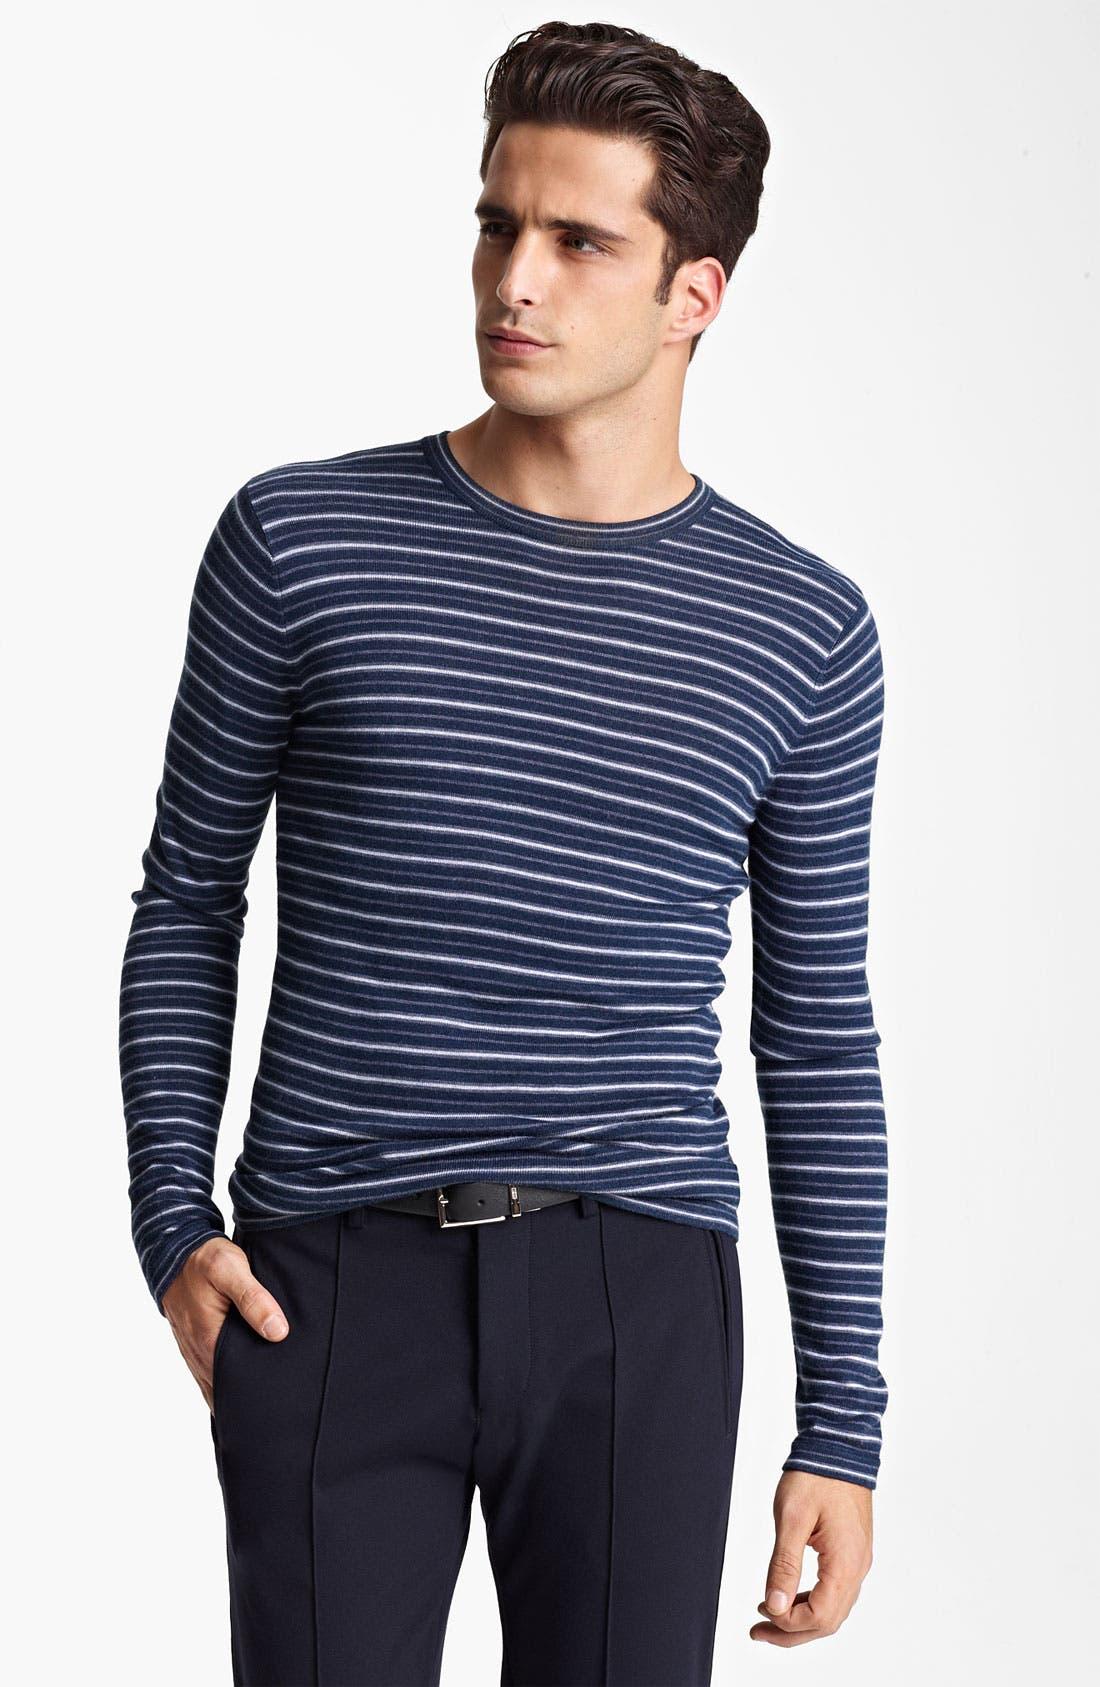 Alternate Image 1 Selected - Armani Collezioni Stripe Crewneck Sweater